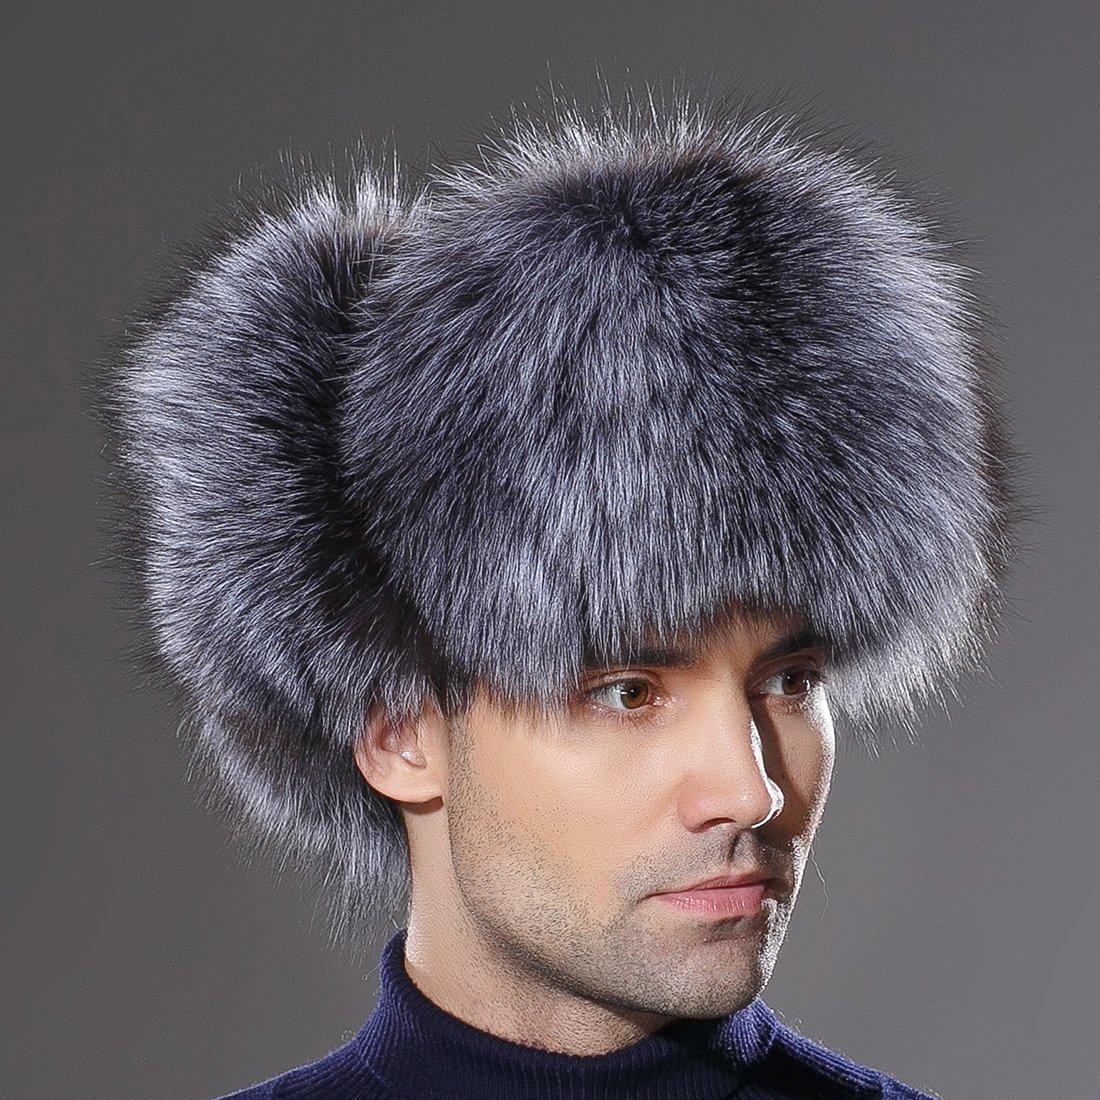 URSFUR Winter Mens Russian Ushanka Hat Real Leather & Silver Fox Fur Trapper Cap by URSFUR (Image #2)